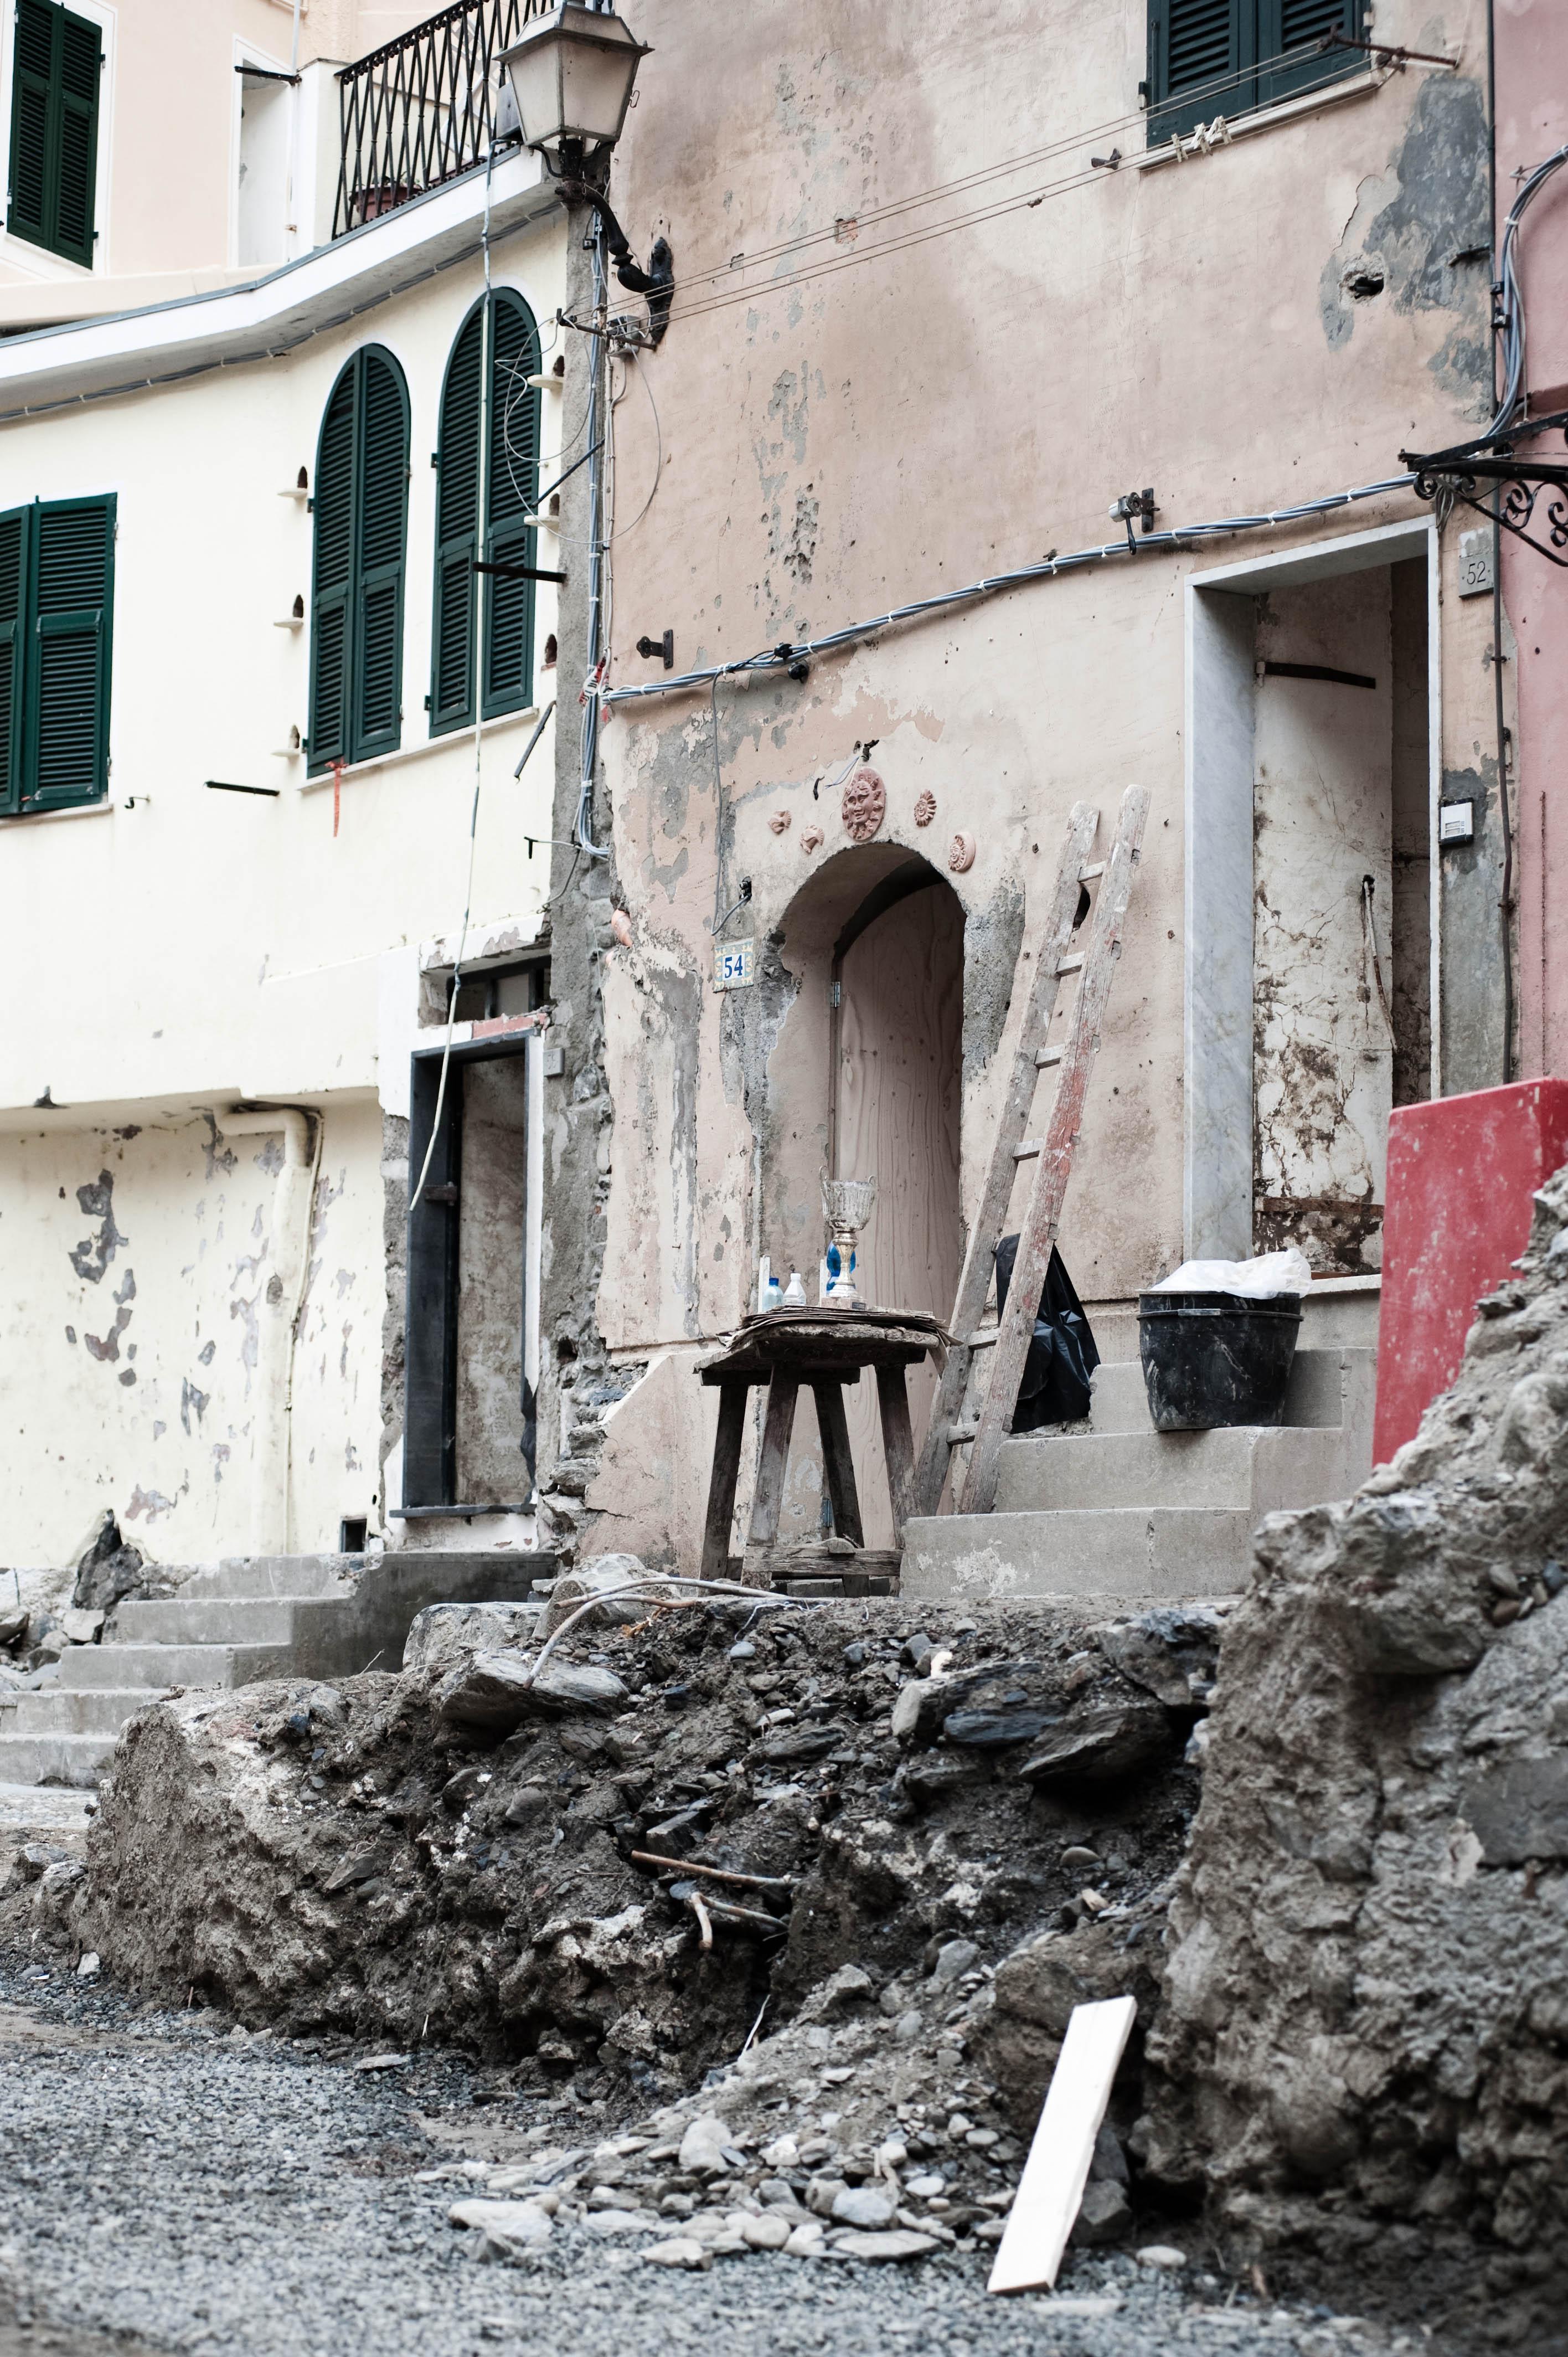 Vernazza Floods - 2 months later